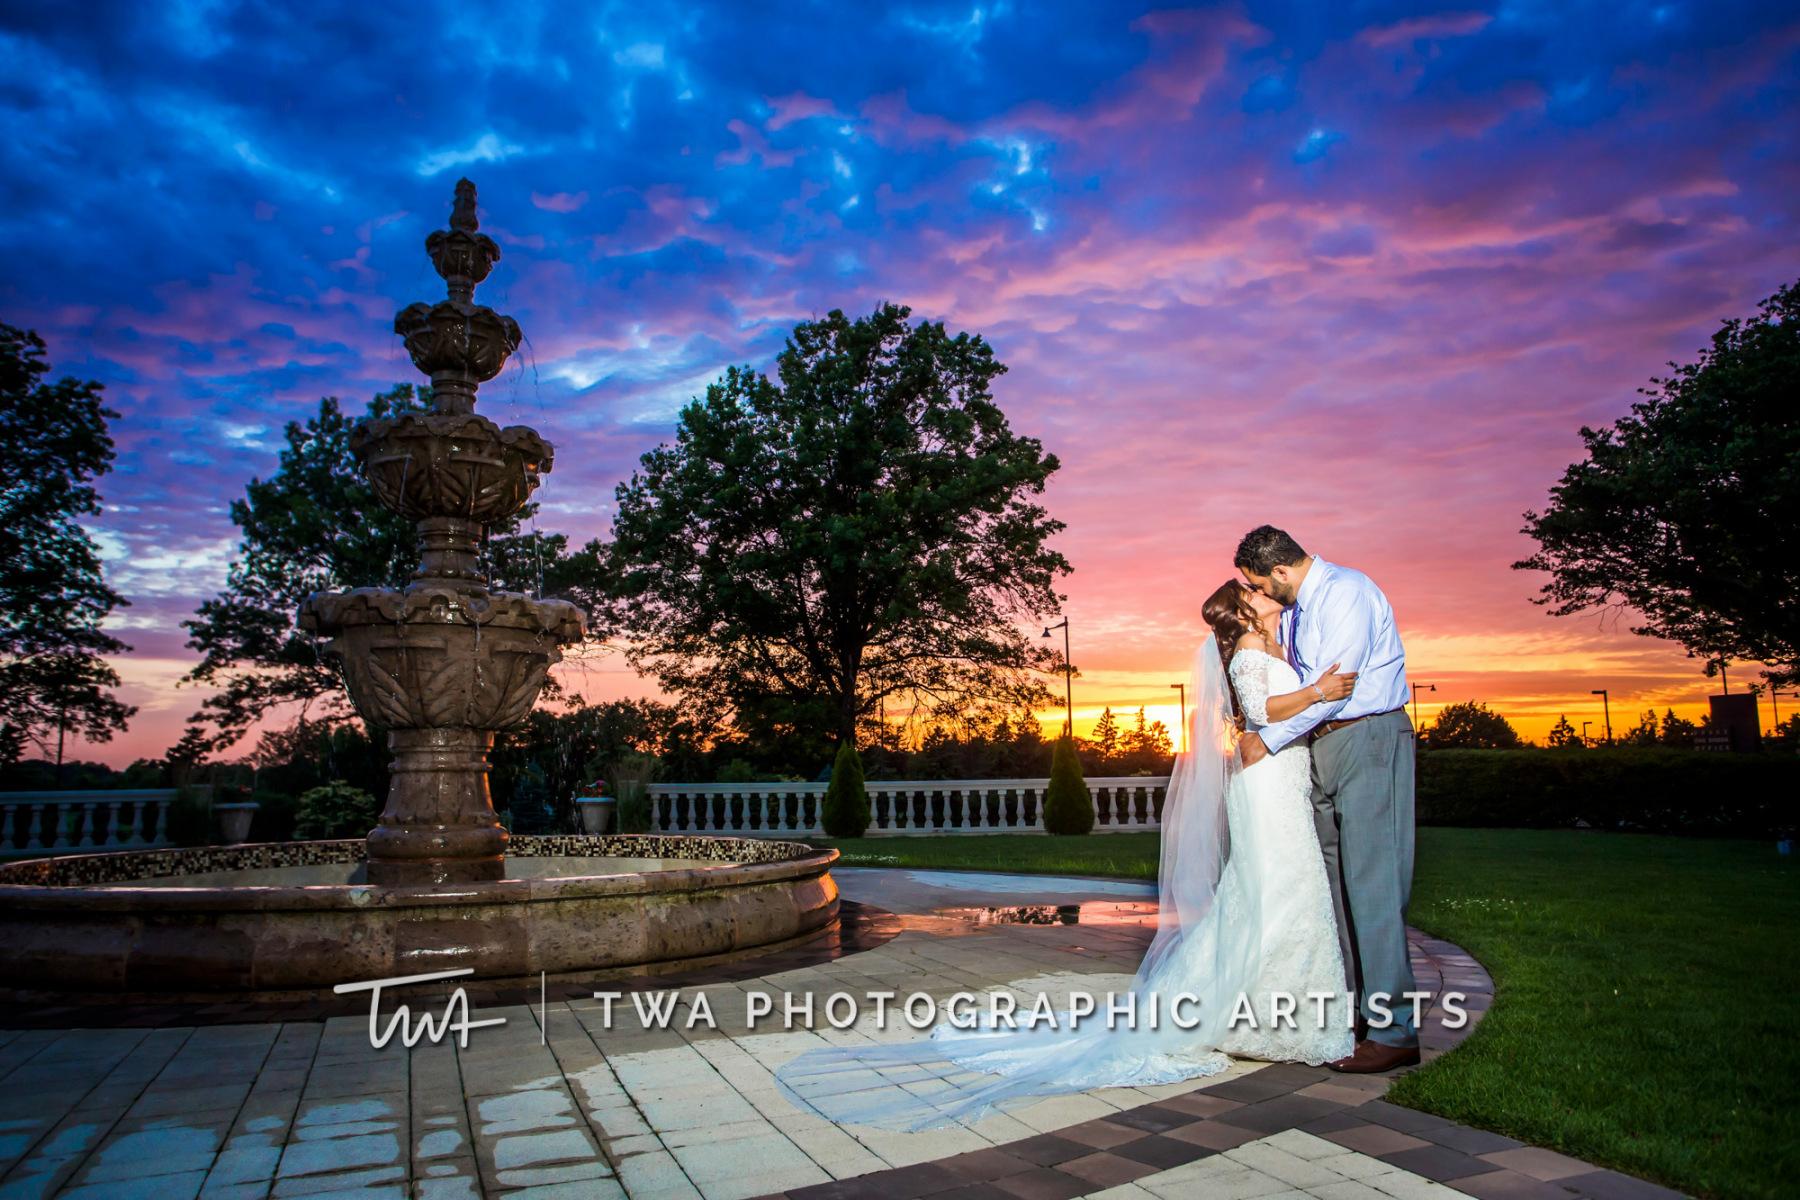 Chicago-Wedding-Photographer-TWA-Photographic-Artists-Drake-Oak-Brook_Ruiz_Madi_MC_DR-0469